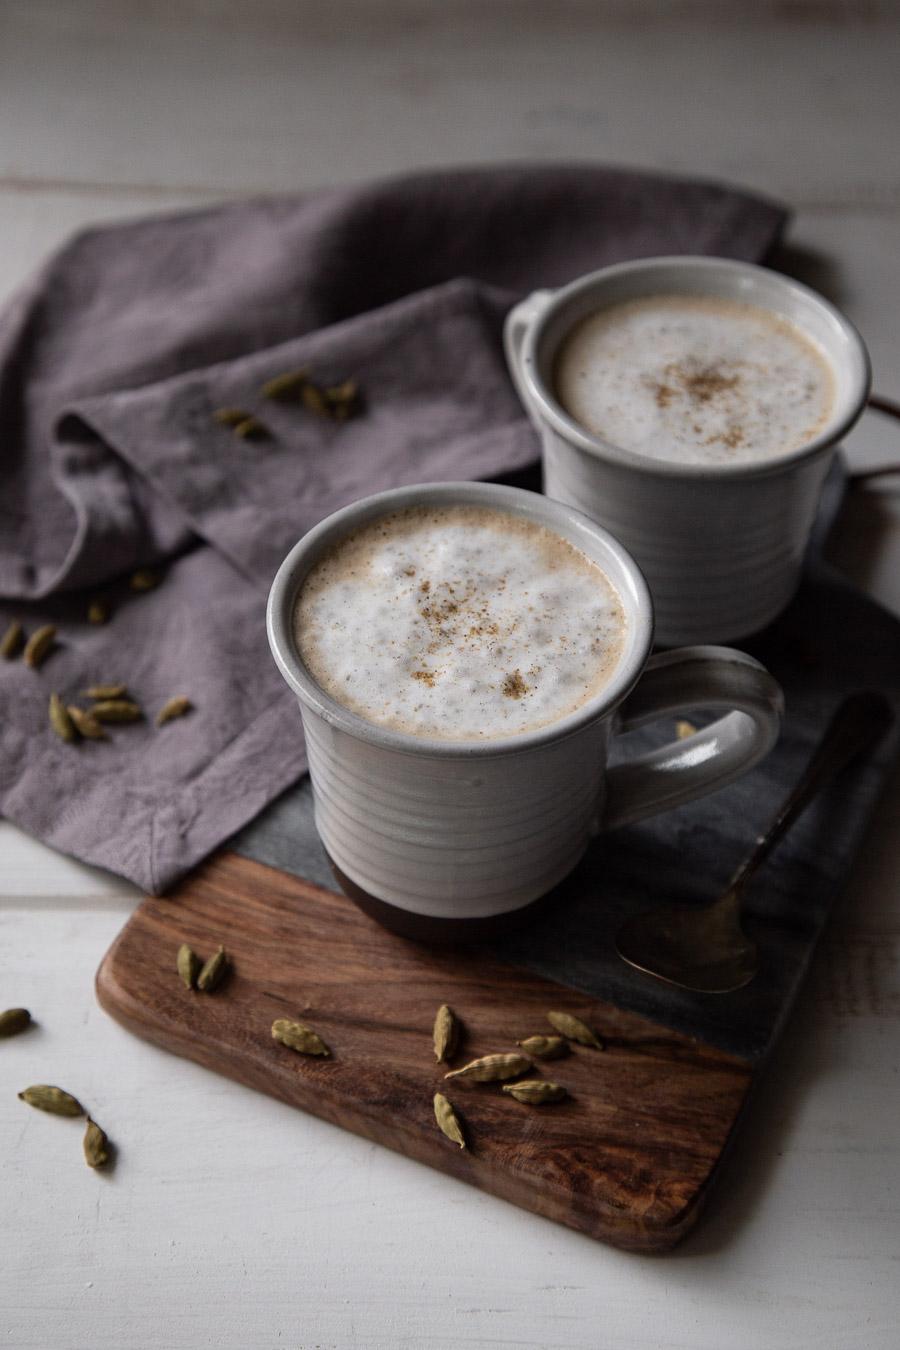 Homemade Cardamom Latte Recipe